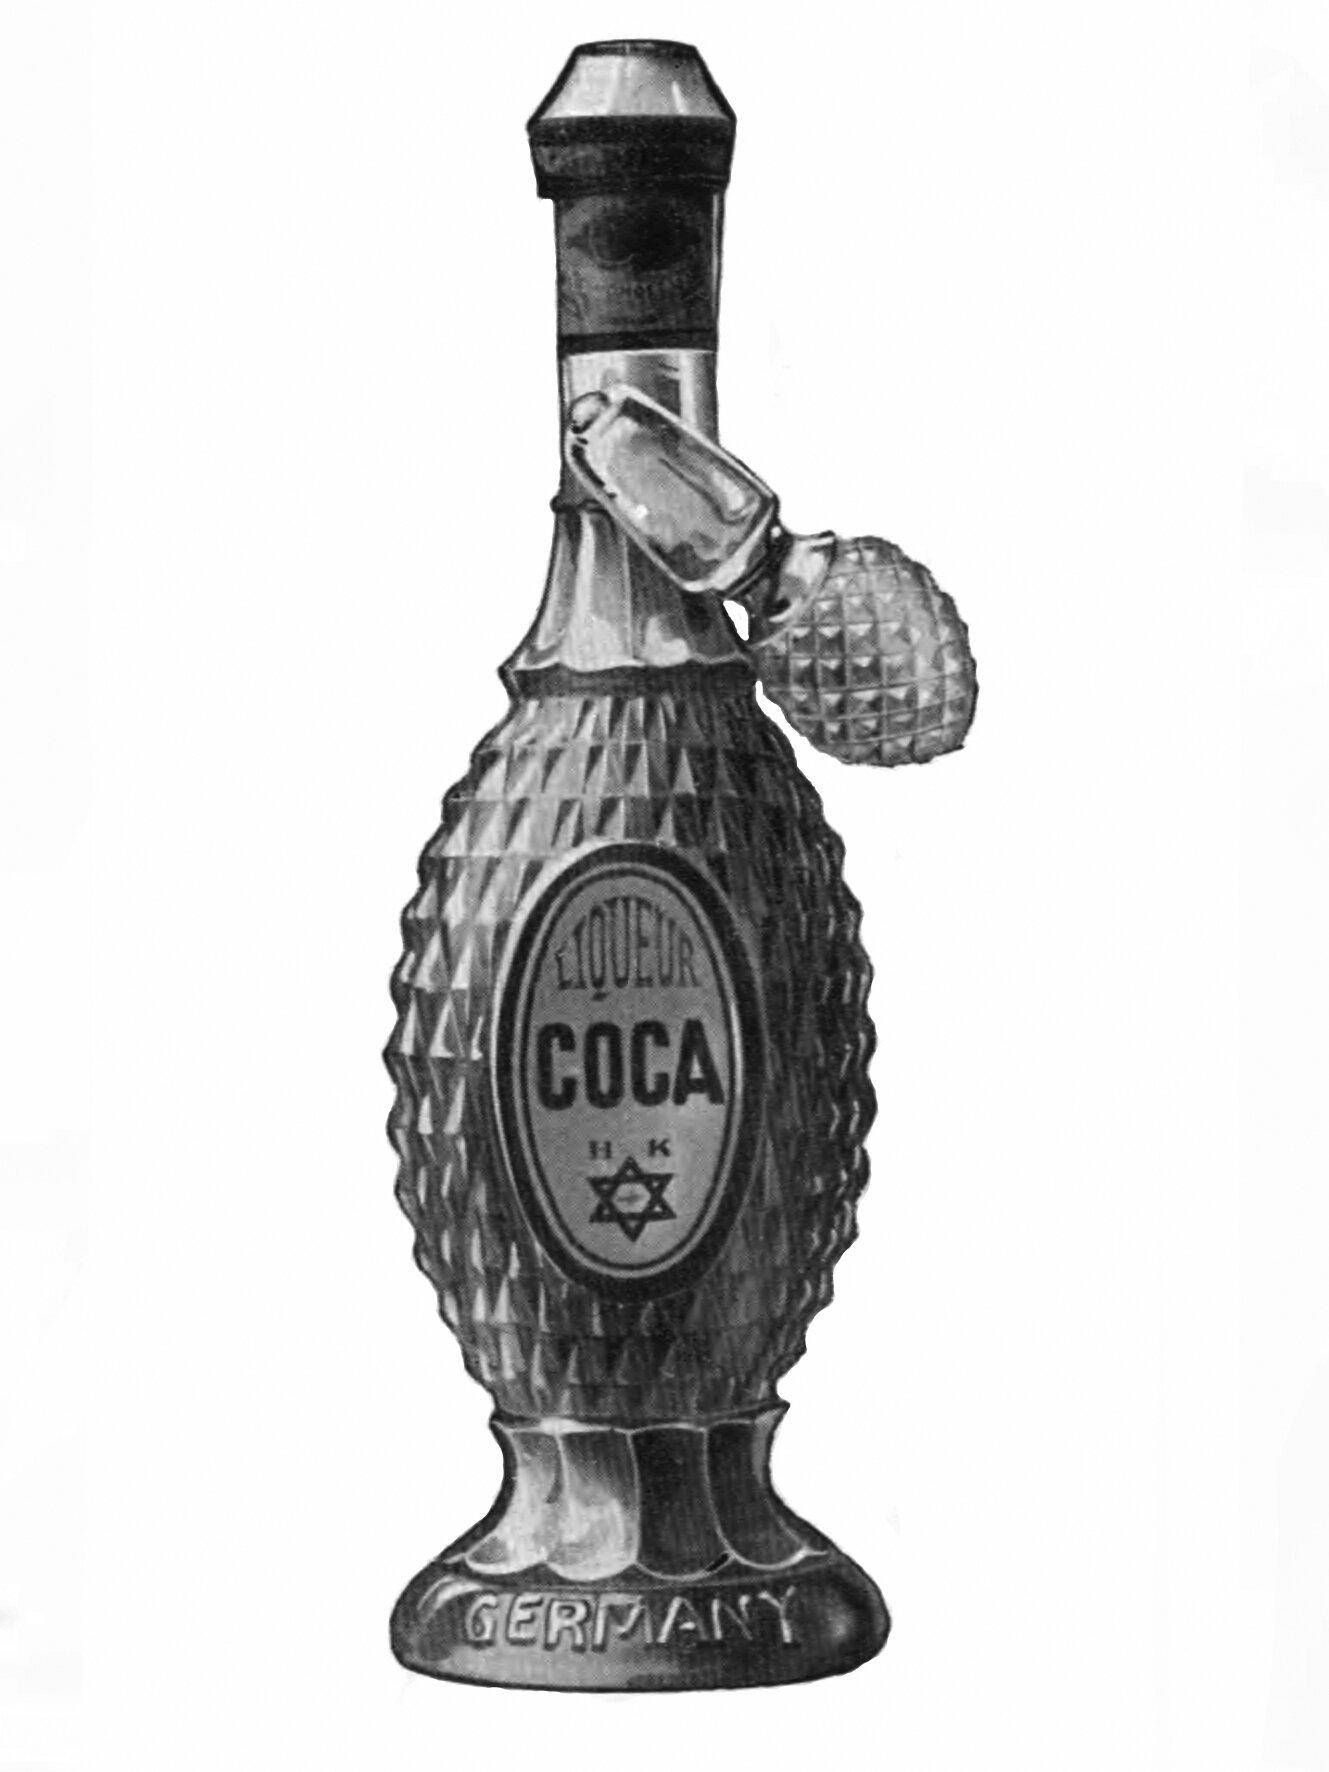 Kantorowicz Coca Likör, © Gerhard Schneider, Leipzig